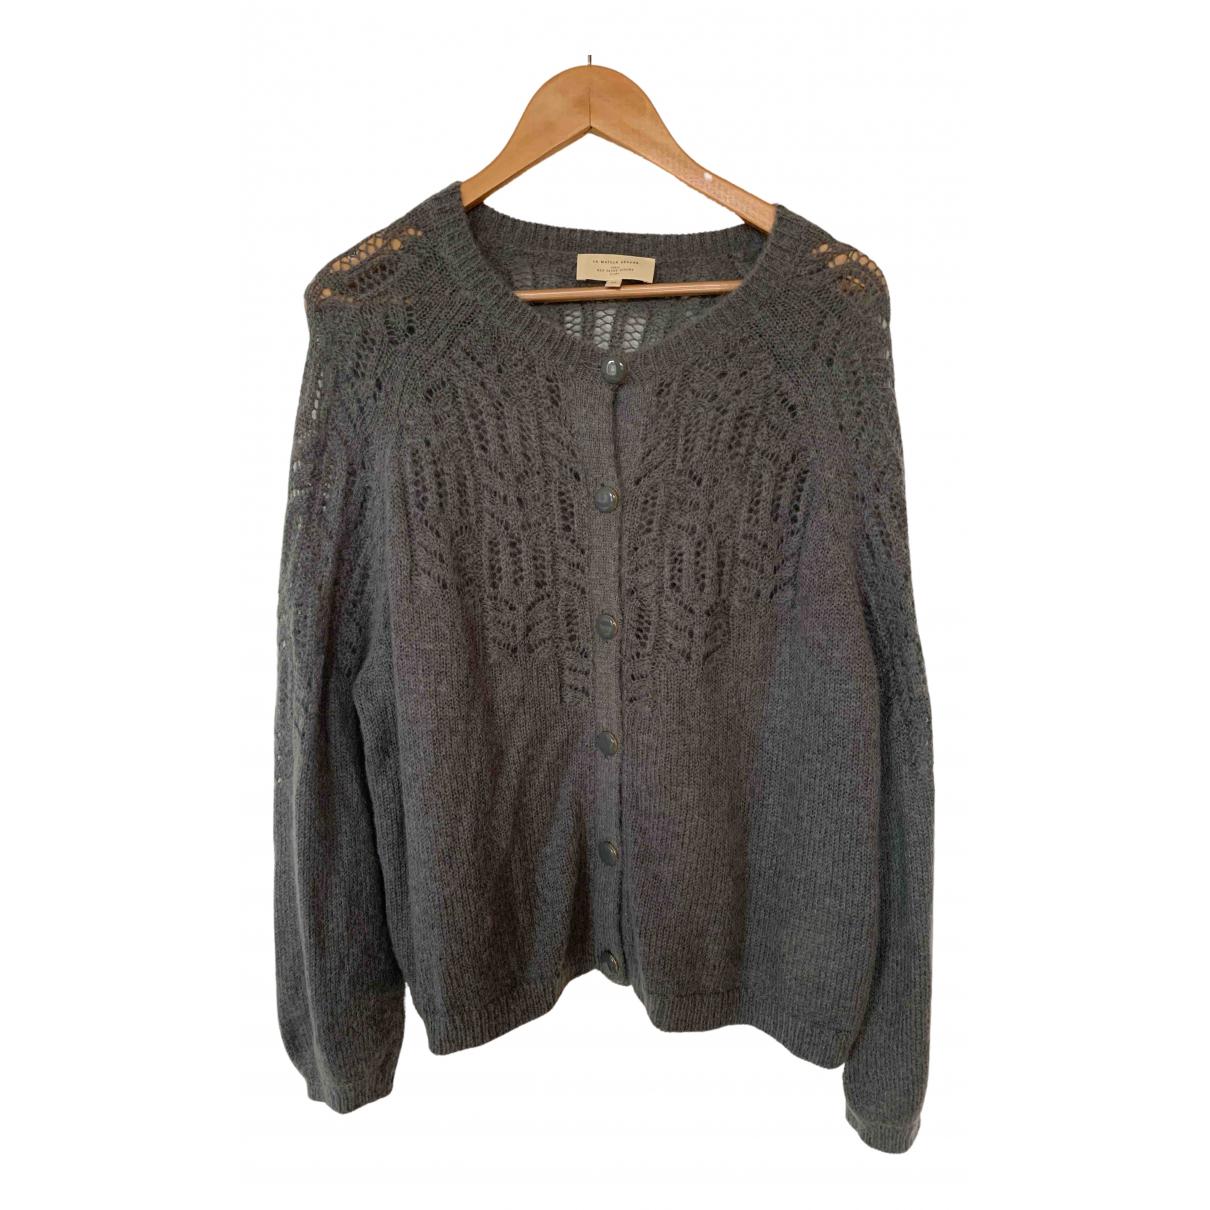 Sezane \N Pullover in  Grau Wolle